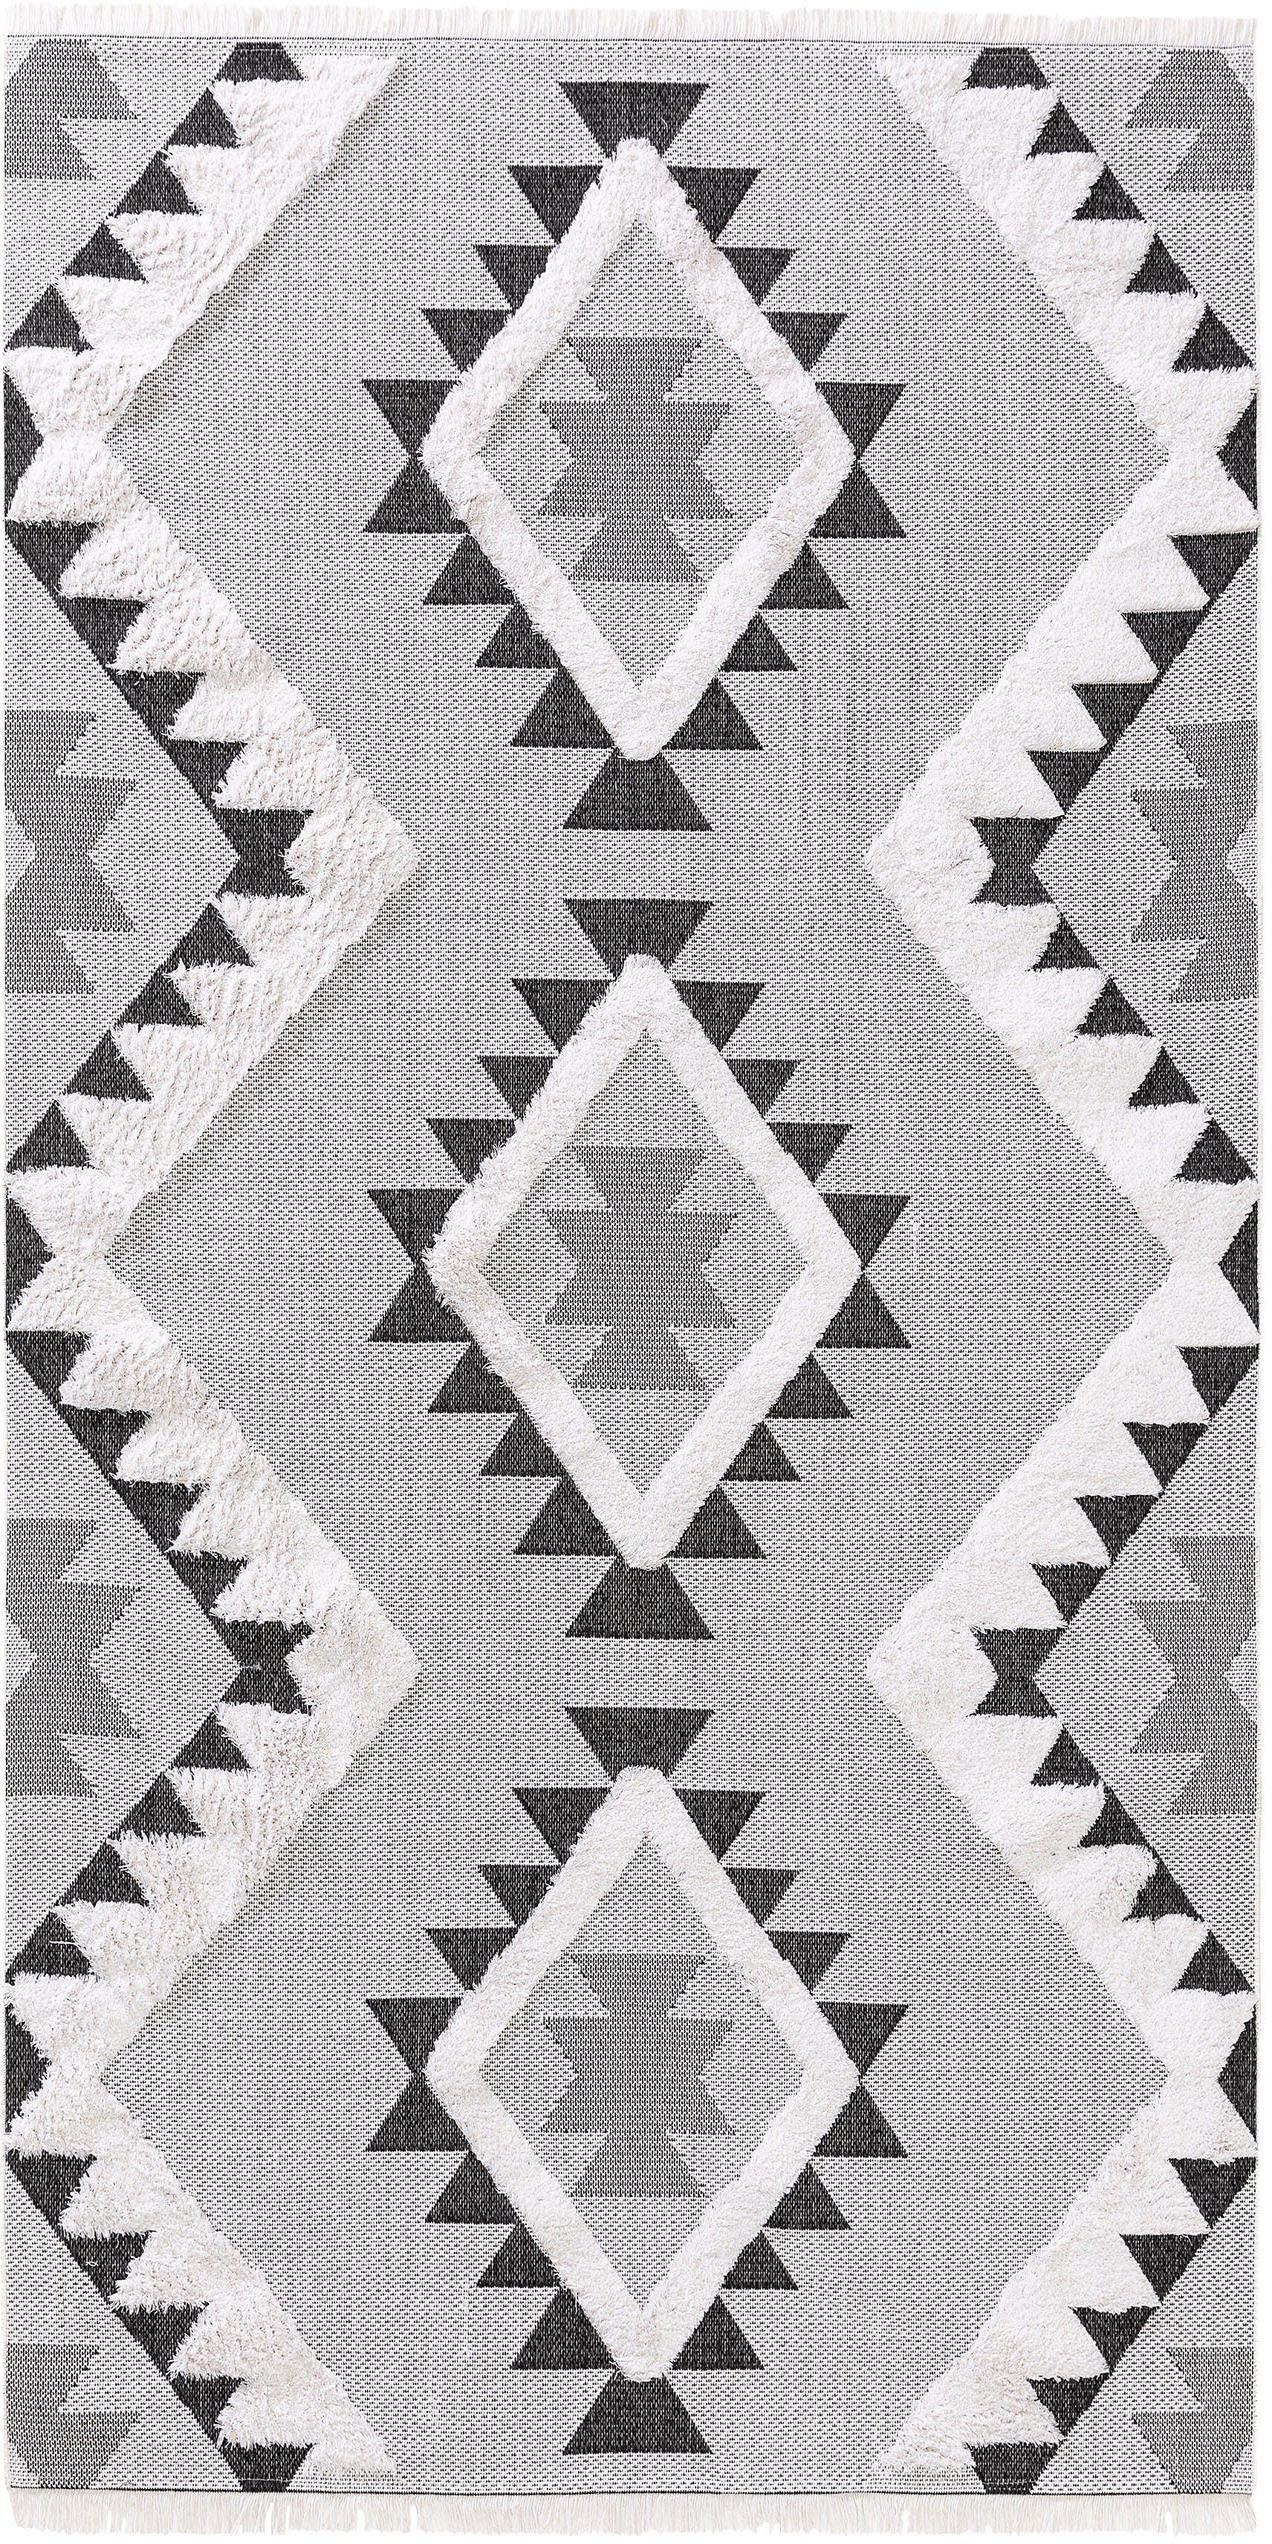 Alfombra lavable de algodón texturizada Oslo Aztec, 100%algodón, Blanco crema, gris, An 75 x L 150 cm (Tamaño XS)